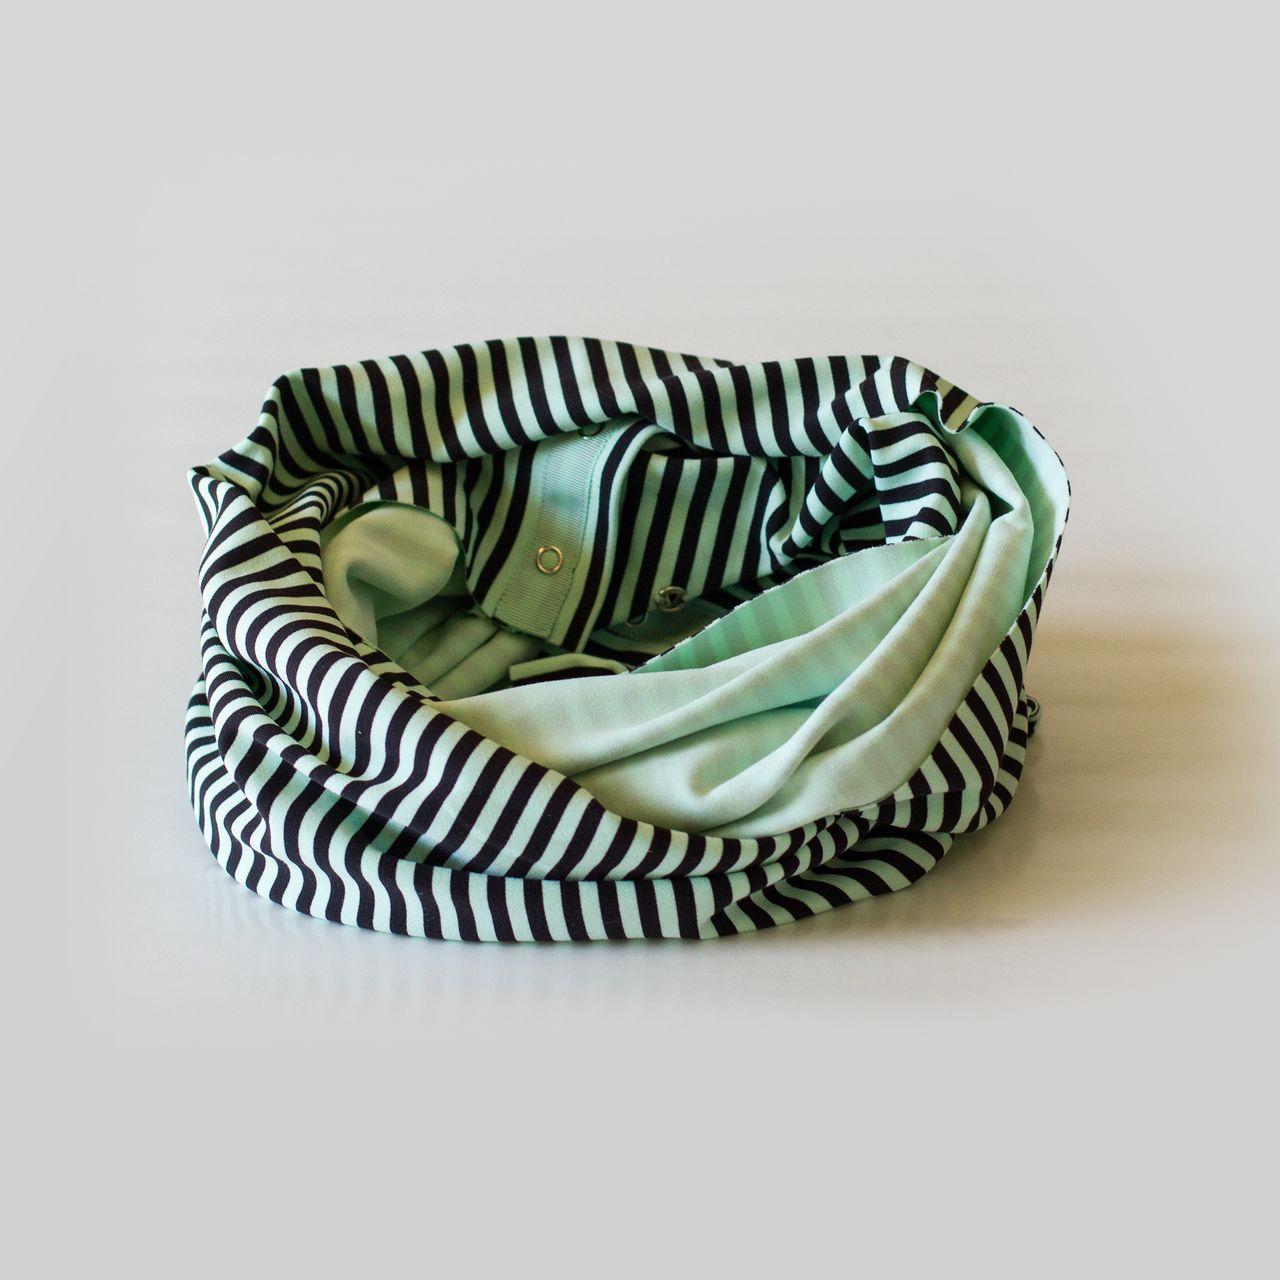 Lululemon Vinyasa Scarf *Rulu - Classic Stripe Mint Moment Black